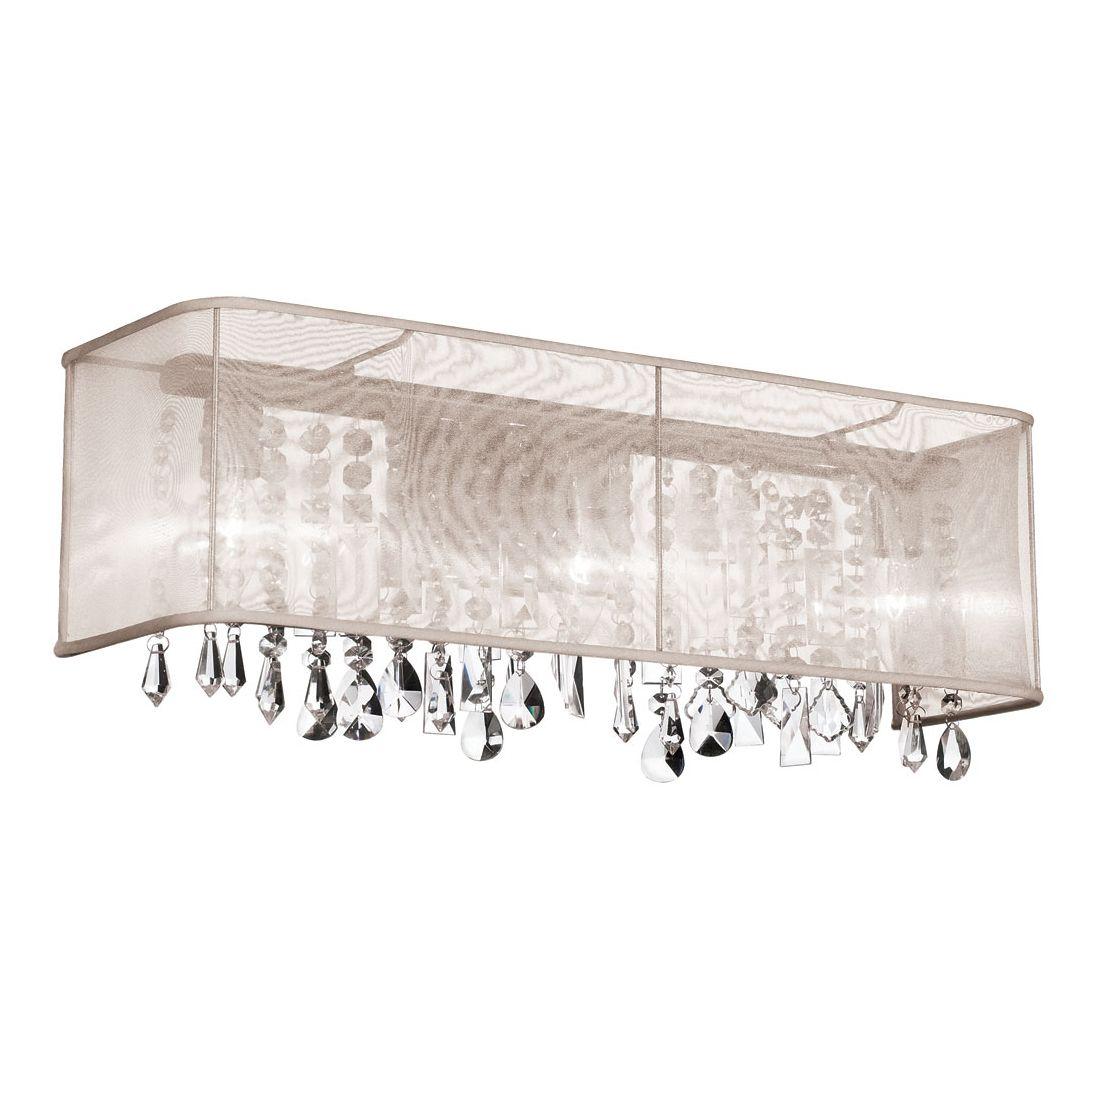 Lowe's Canada Bathroom Vanity Lighting dainolite 85324w 4 light crystal vanity sconce with rectangle